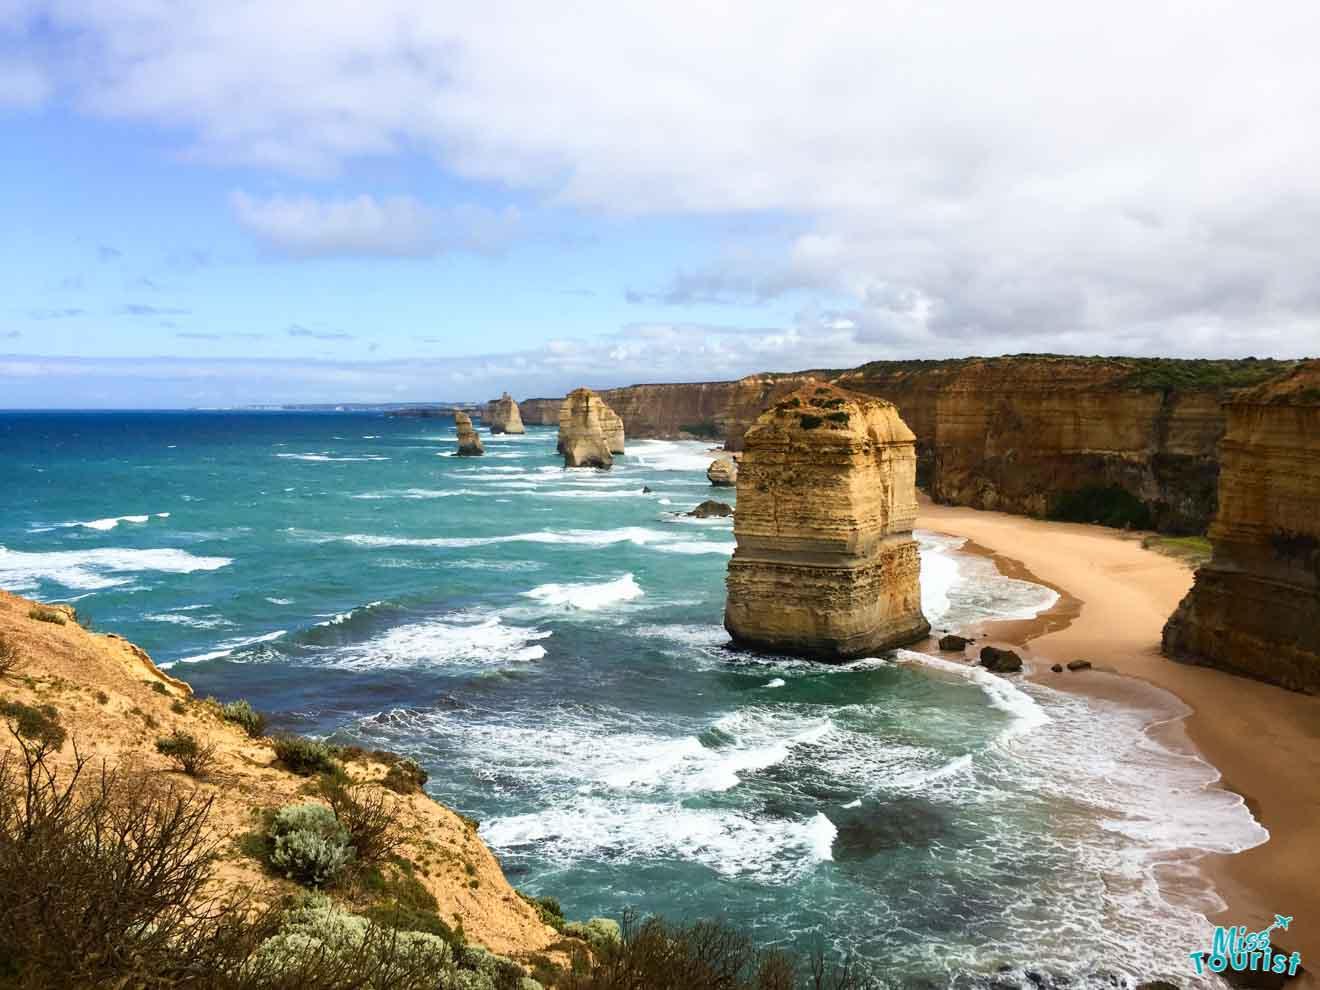 great ocean road recommended stops - Twelve Apostles Great ocean road itinerary